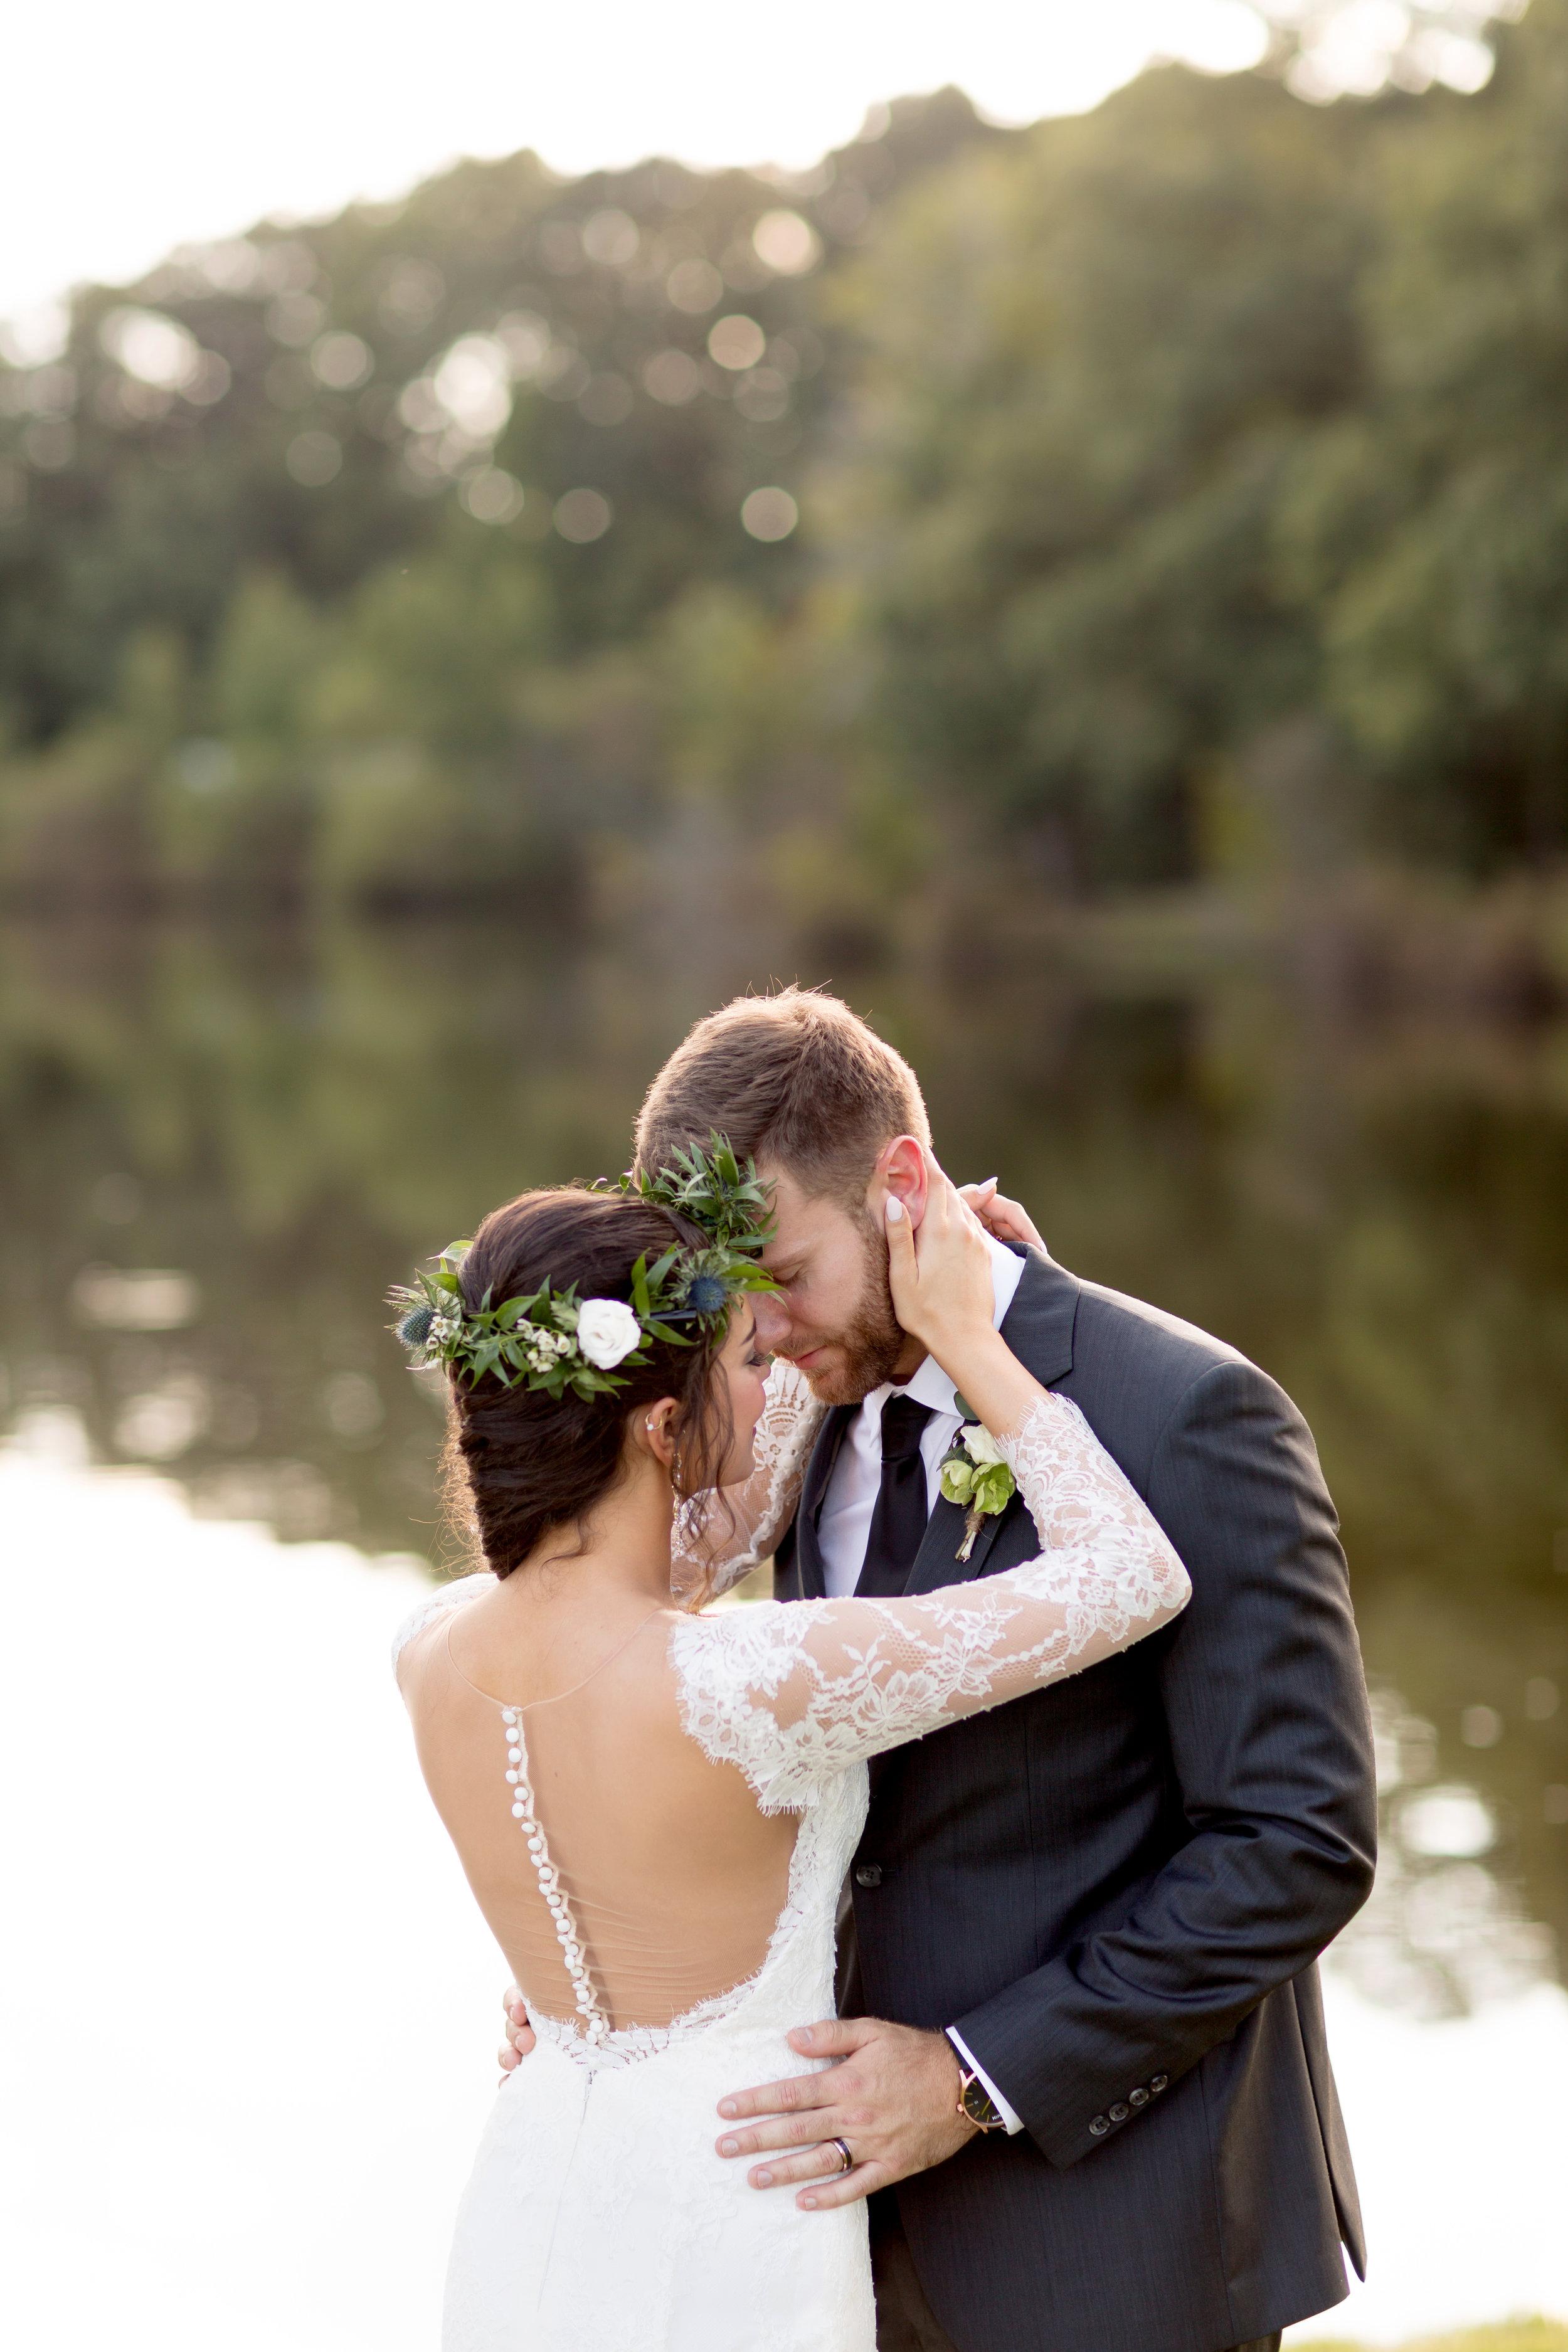 20170915_Redfern_Wedding_2380.jpg